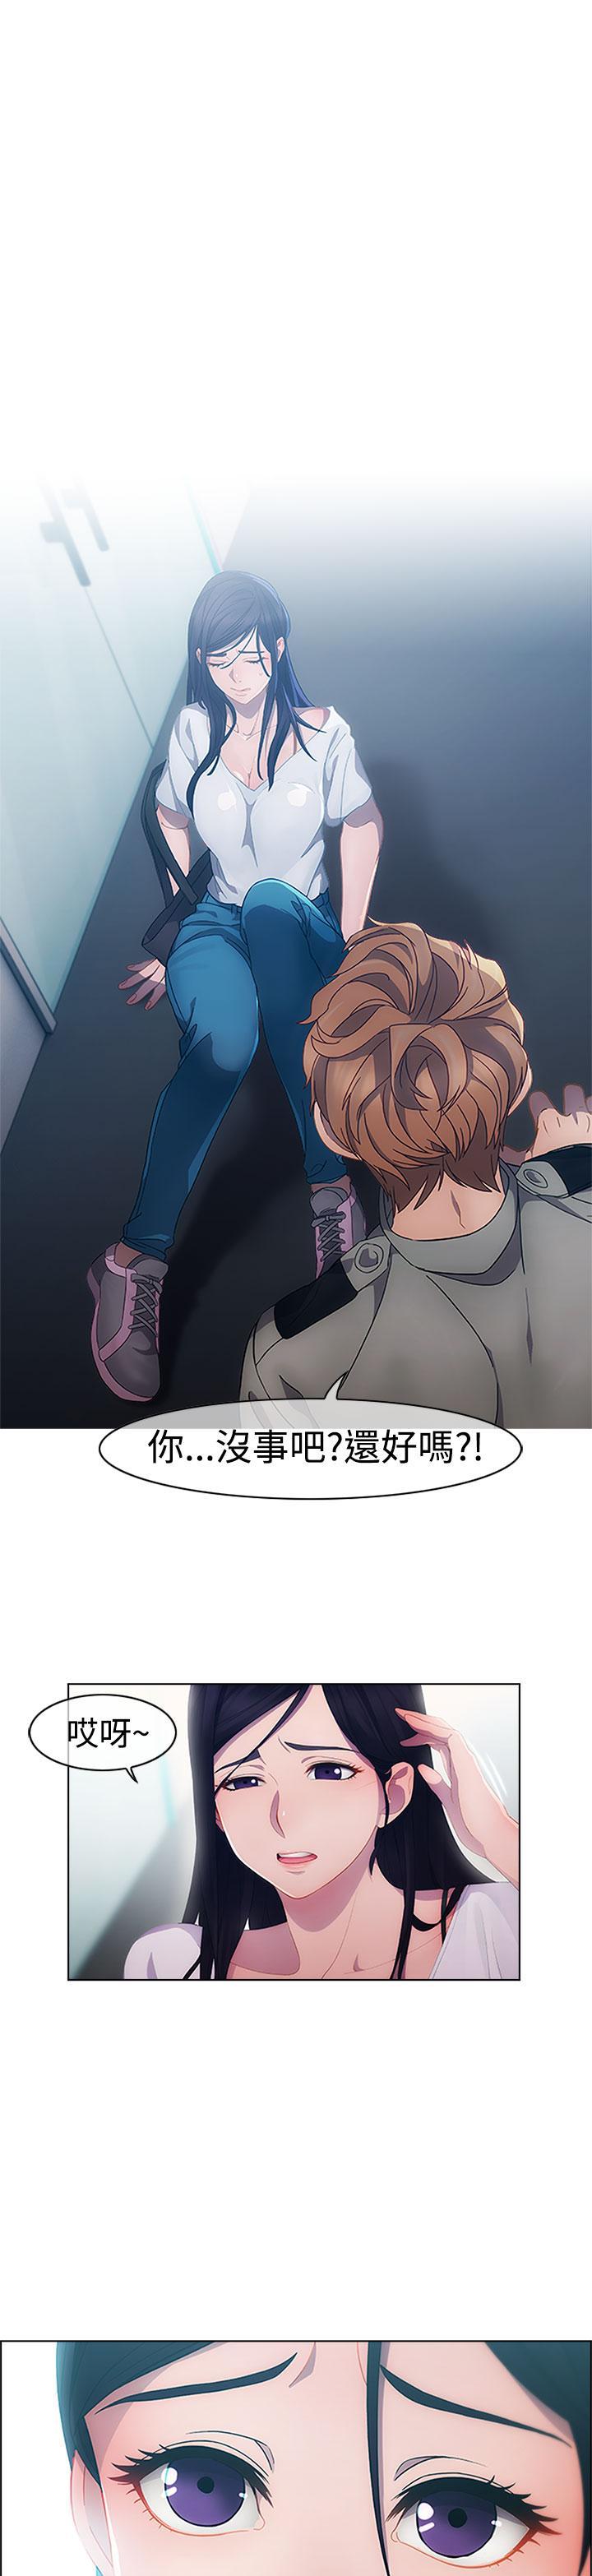 [Studio Gale] Lady Garden淑女花苑 第1話 [Chinese]中文 23